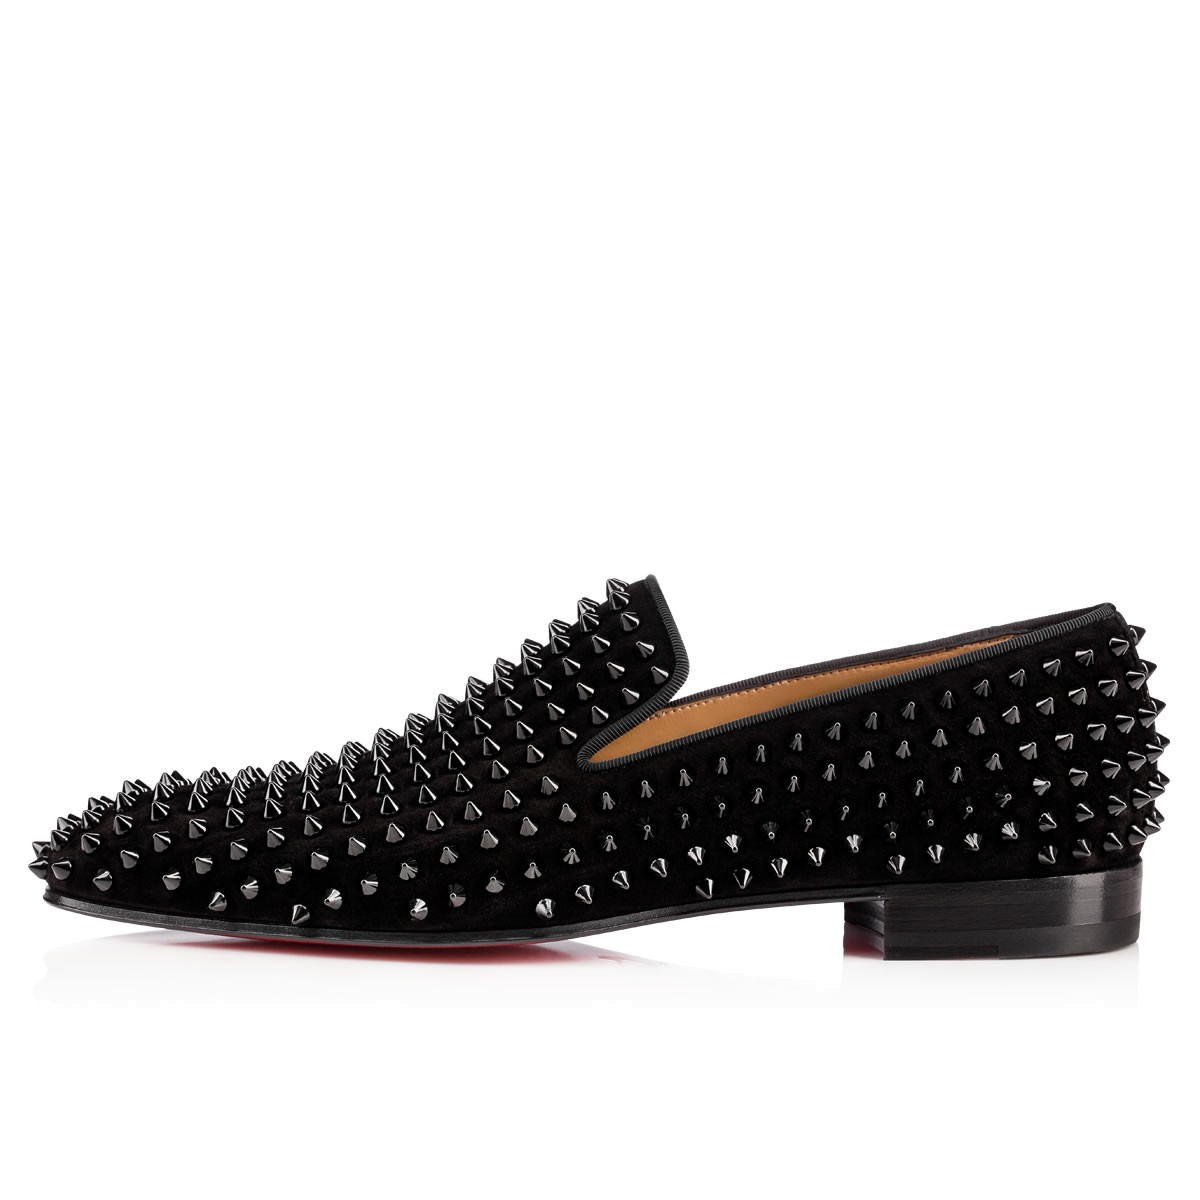 Men Shoes - Dandelion Spikes - Christian Louboutin